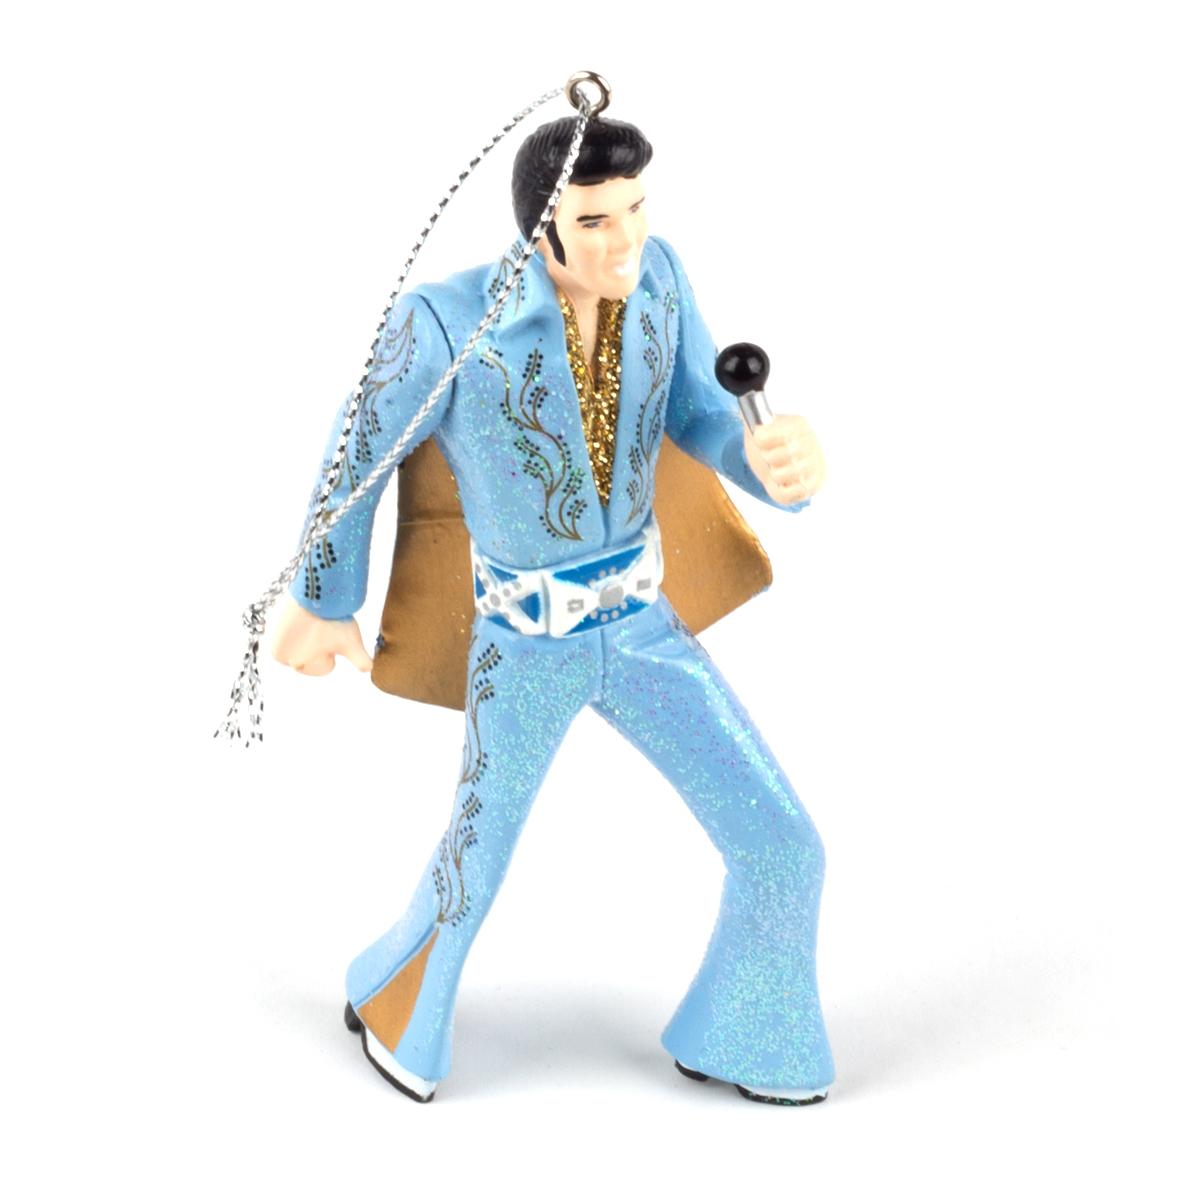 Elvis Presley - Blue Jumpsuit Ornament